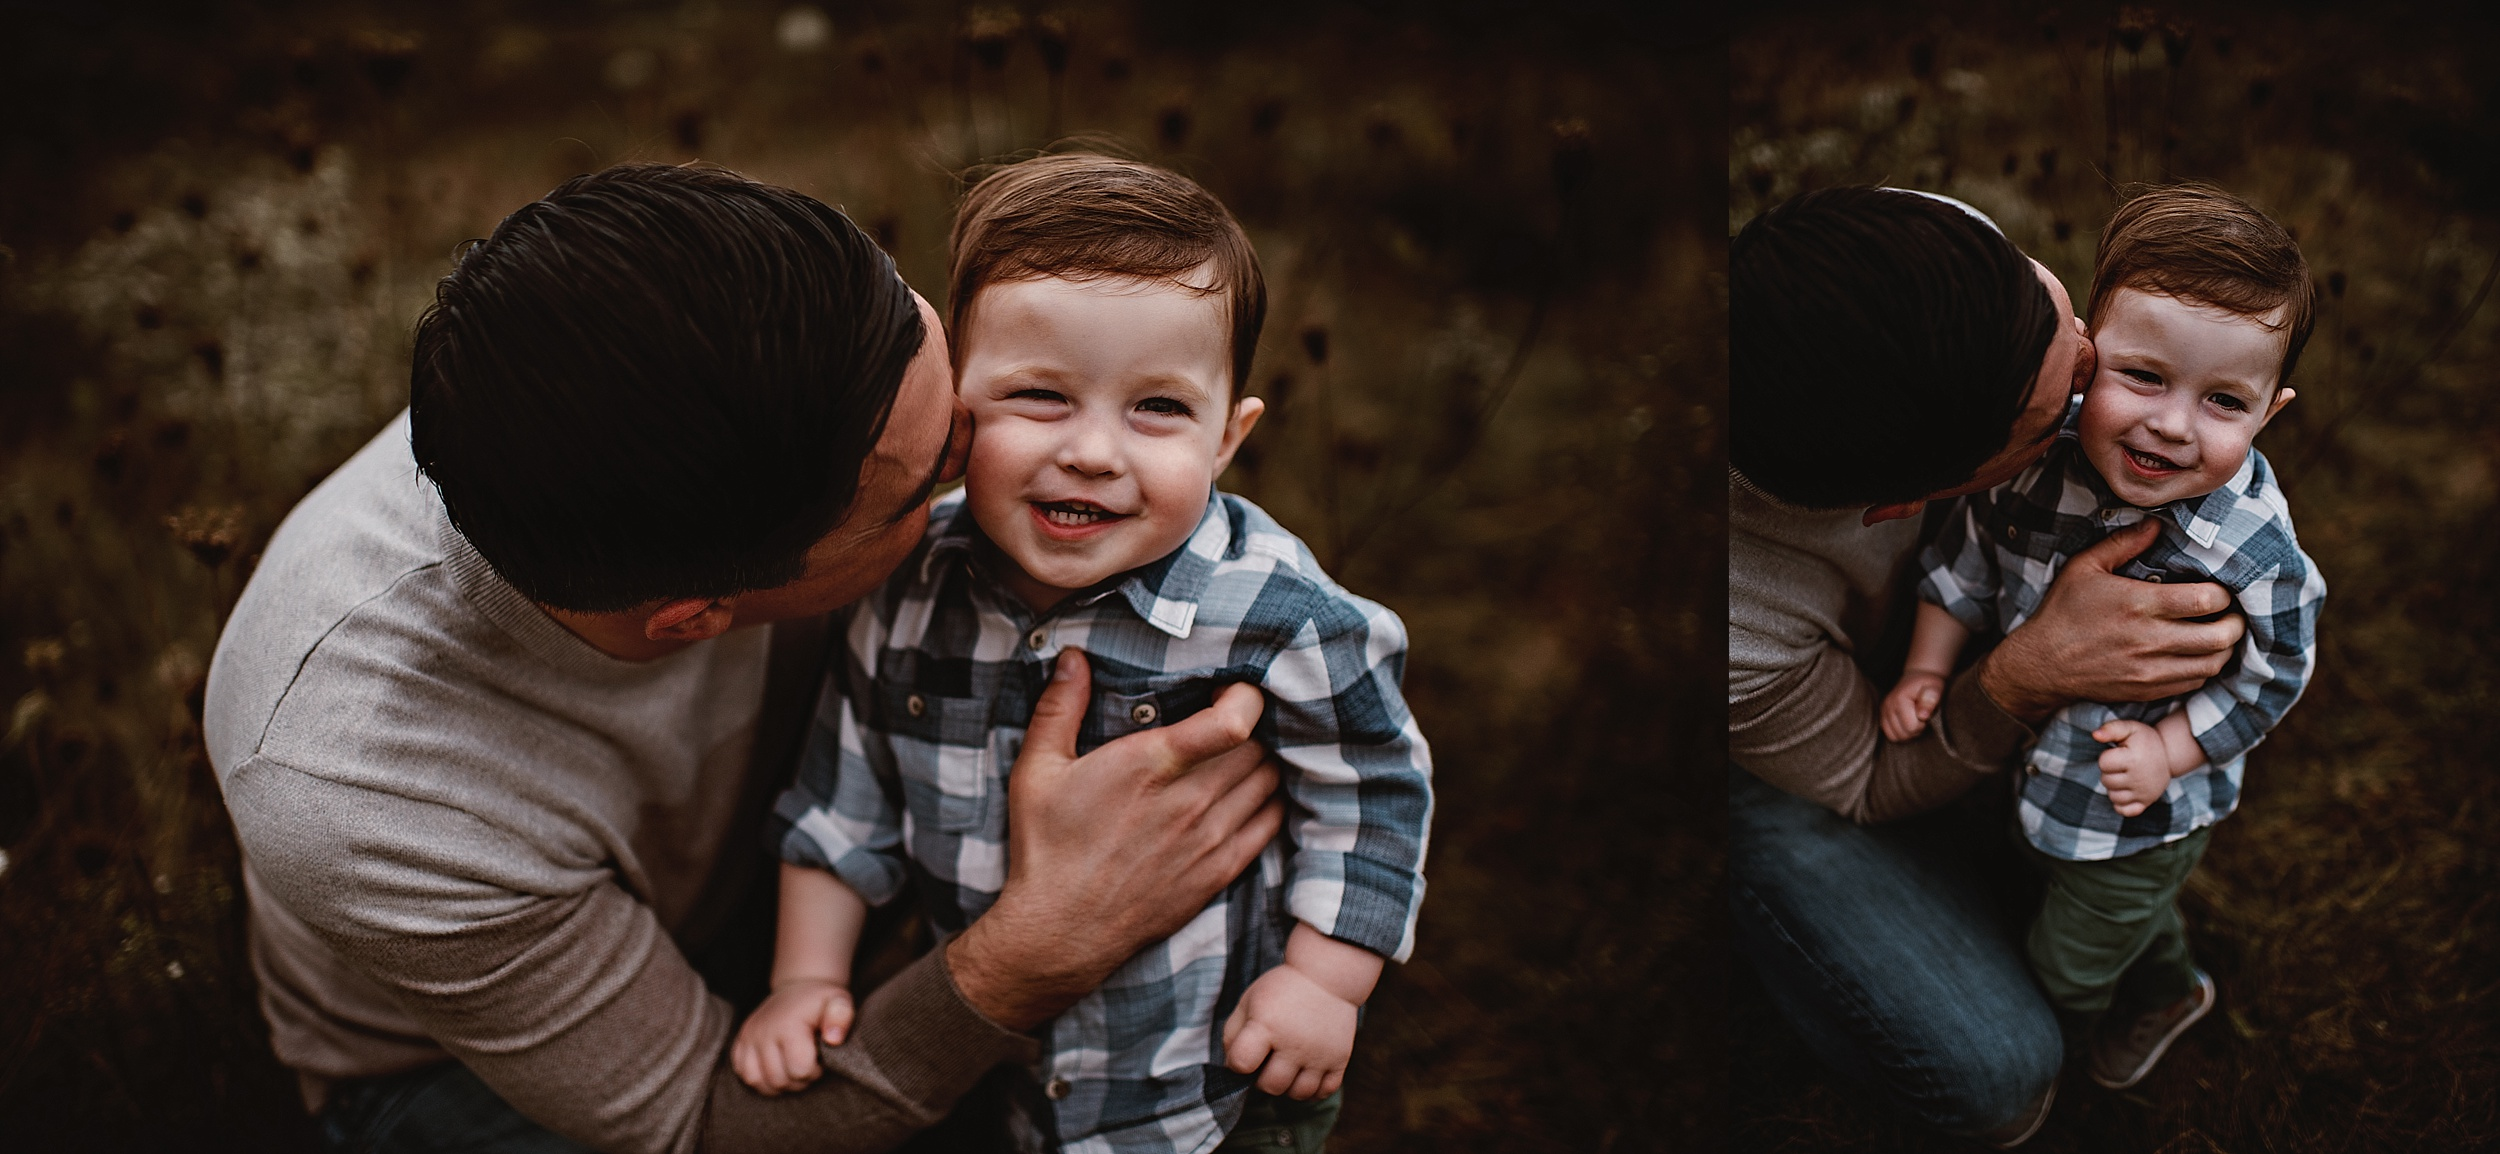 lauren-grayson-photography-portrait-artist-akron-cleveland-ohio-photographer-family-session-fields-sunset-fall_0195.jpg